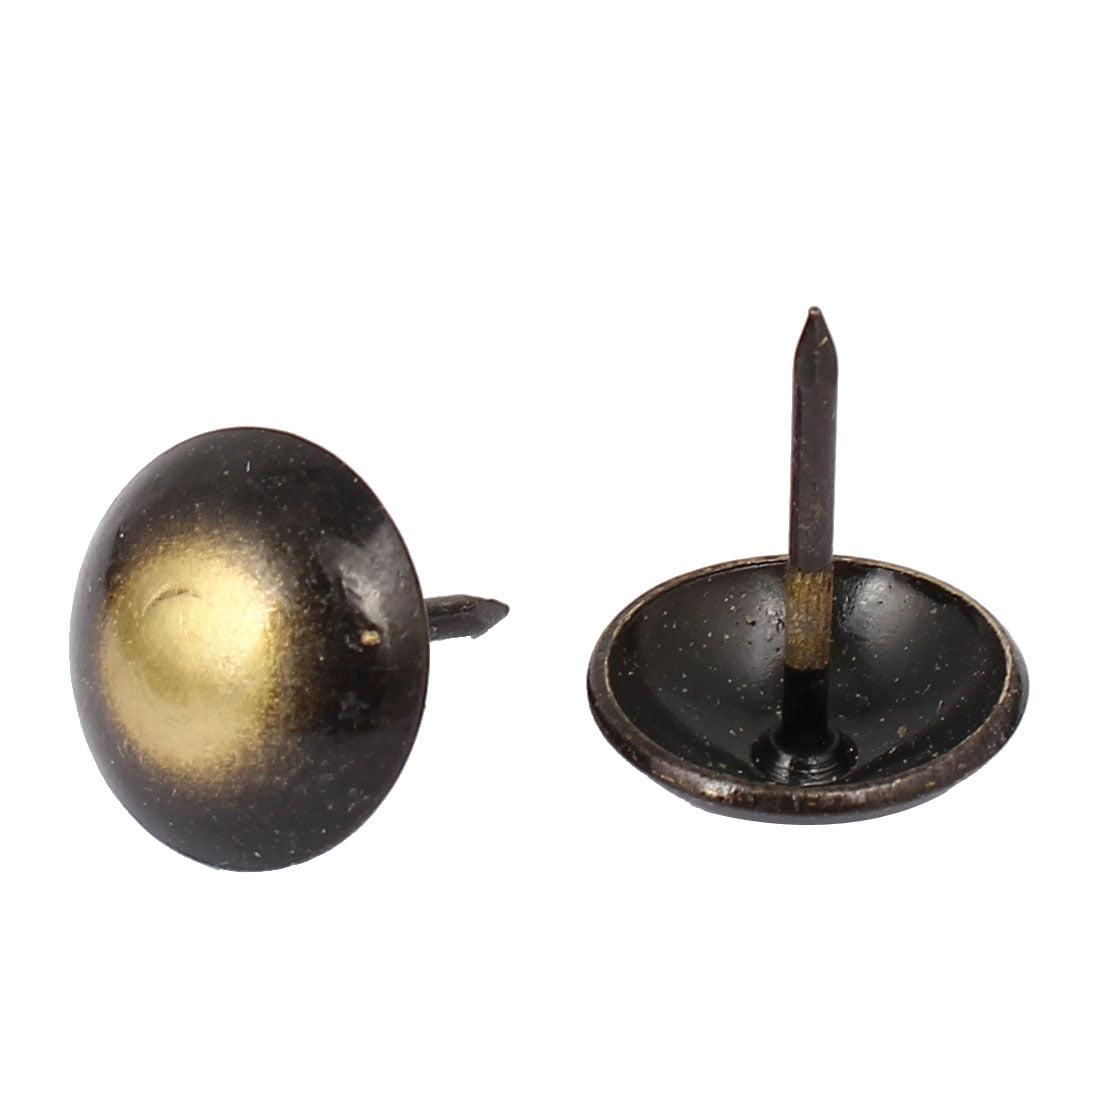 Furniture Iron Round Dome Head Upholstery Tack Push Nail Pushpin 16mm Dia 120pcs